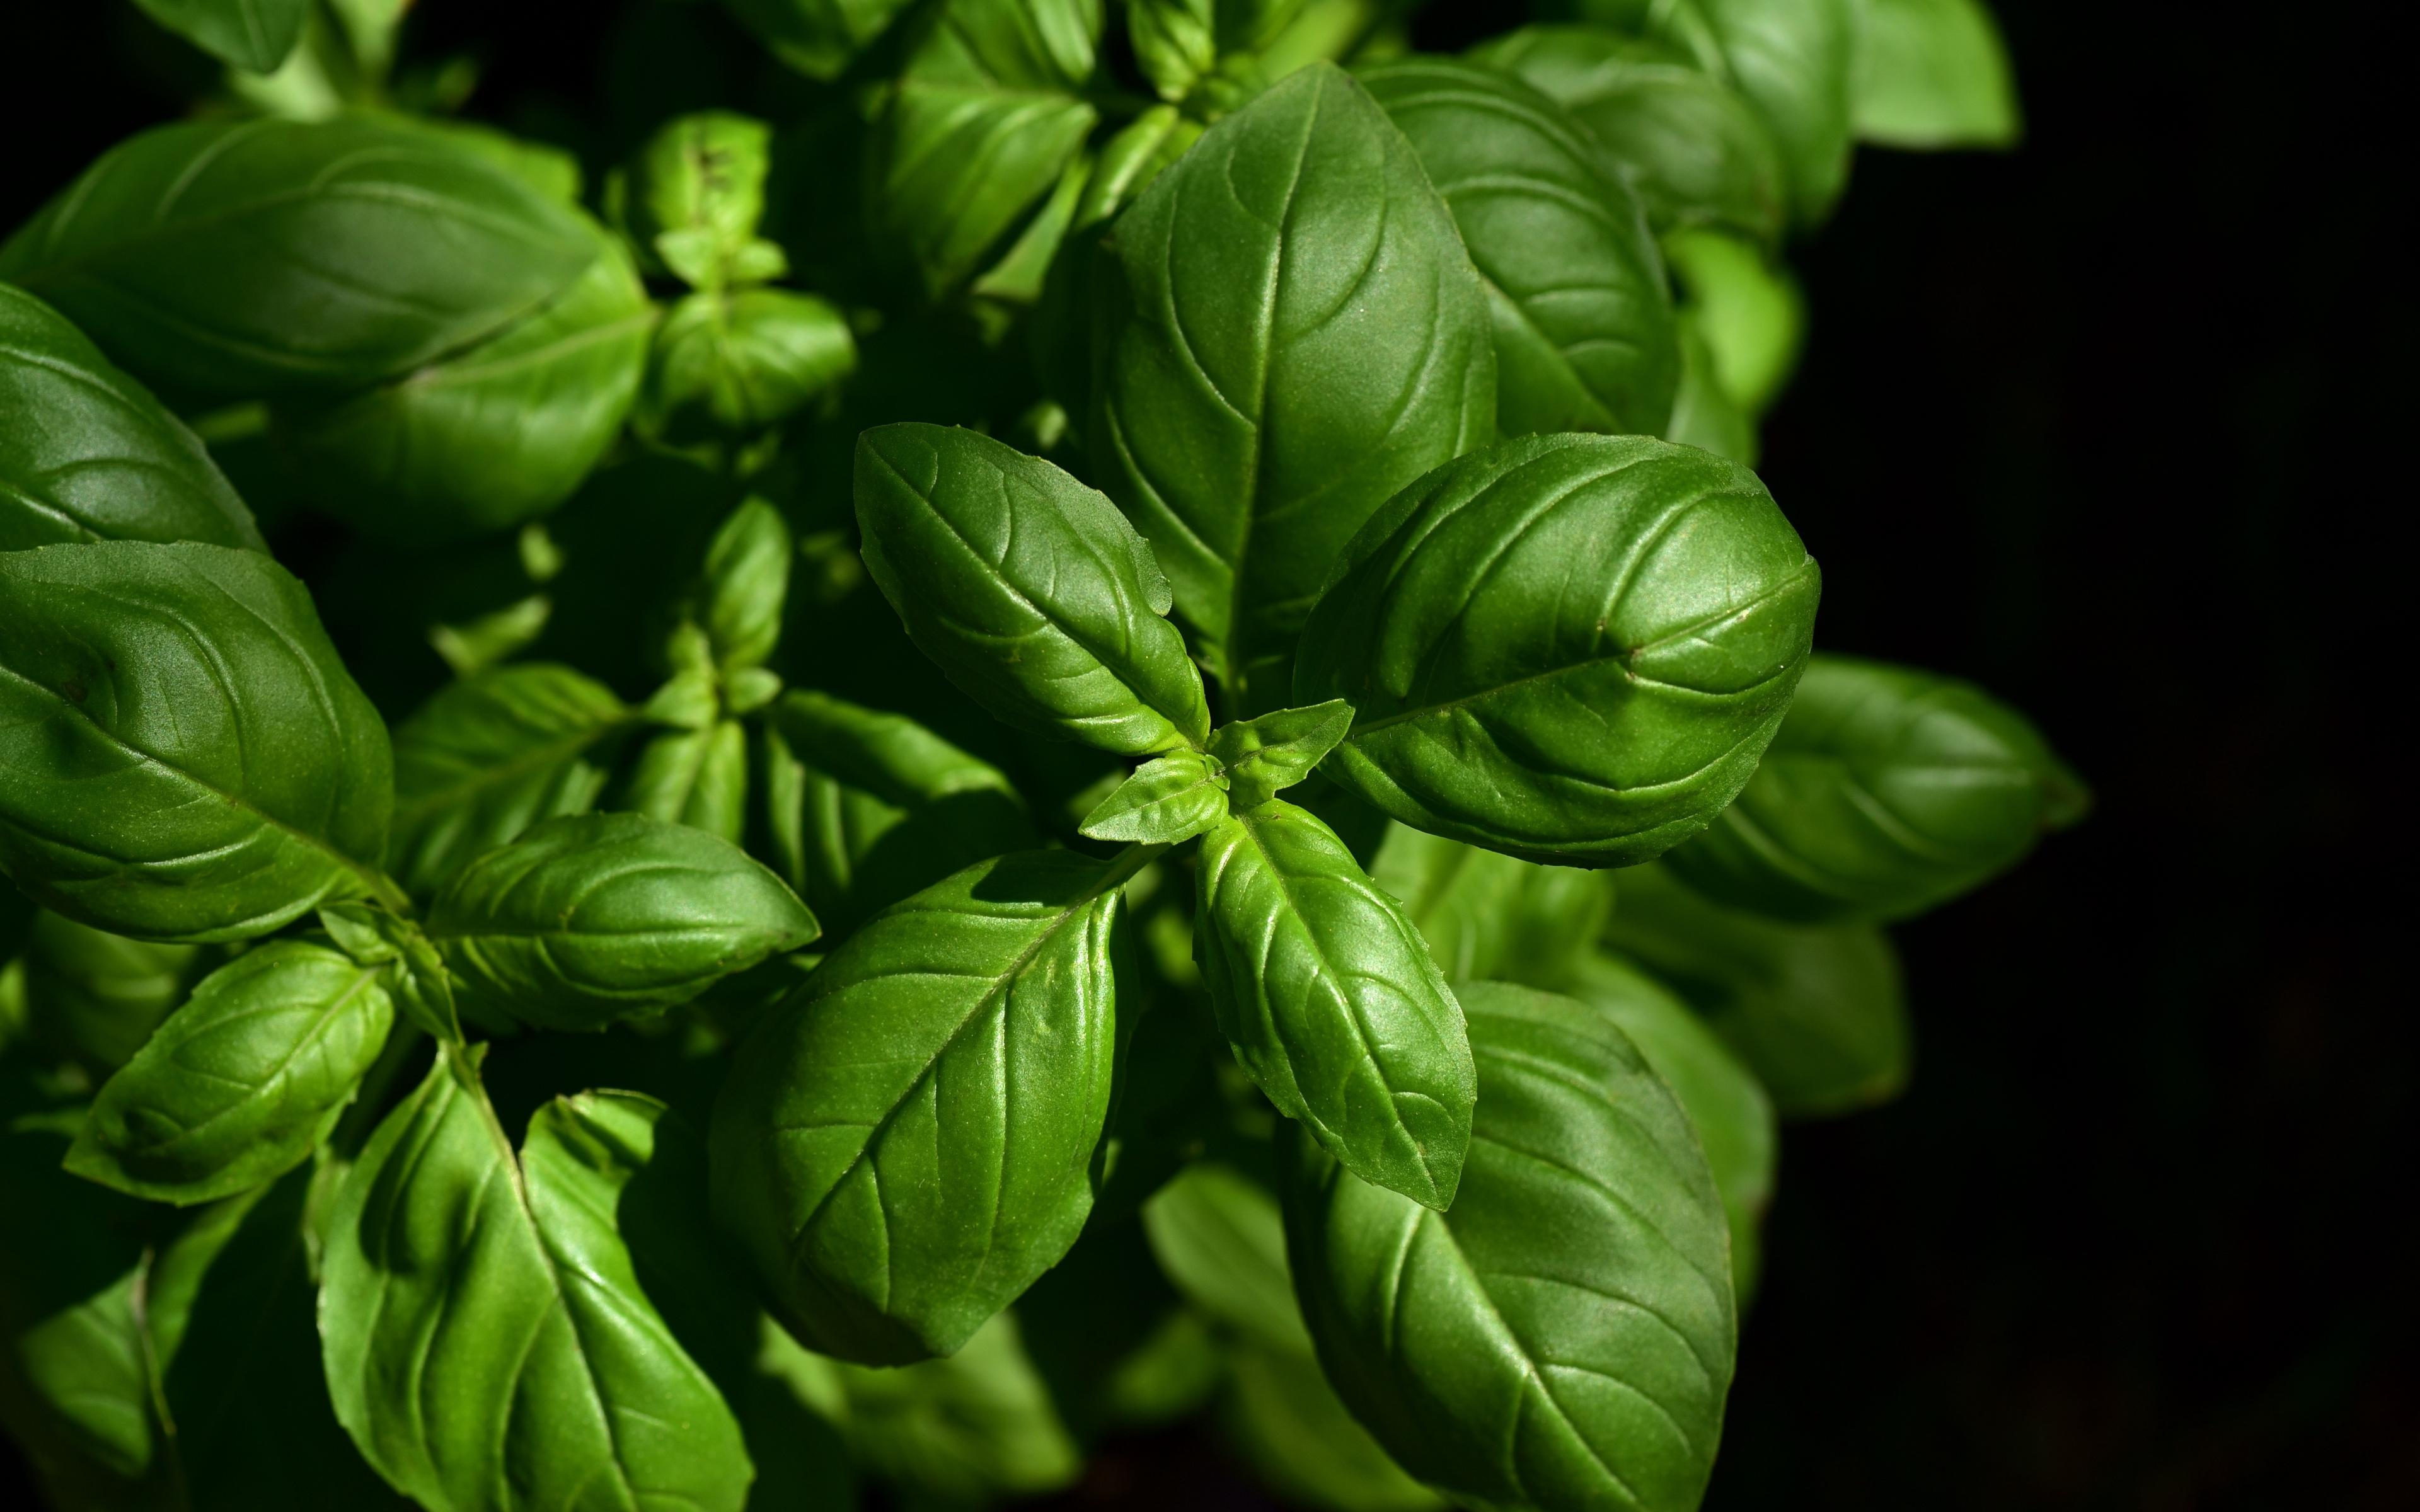 Download wallpaper 3840x2400 basil leaves green plant 4k ultra 3840x2400